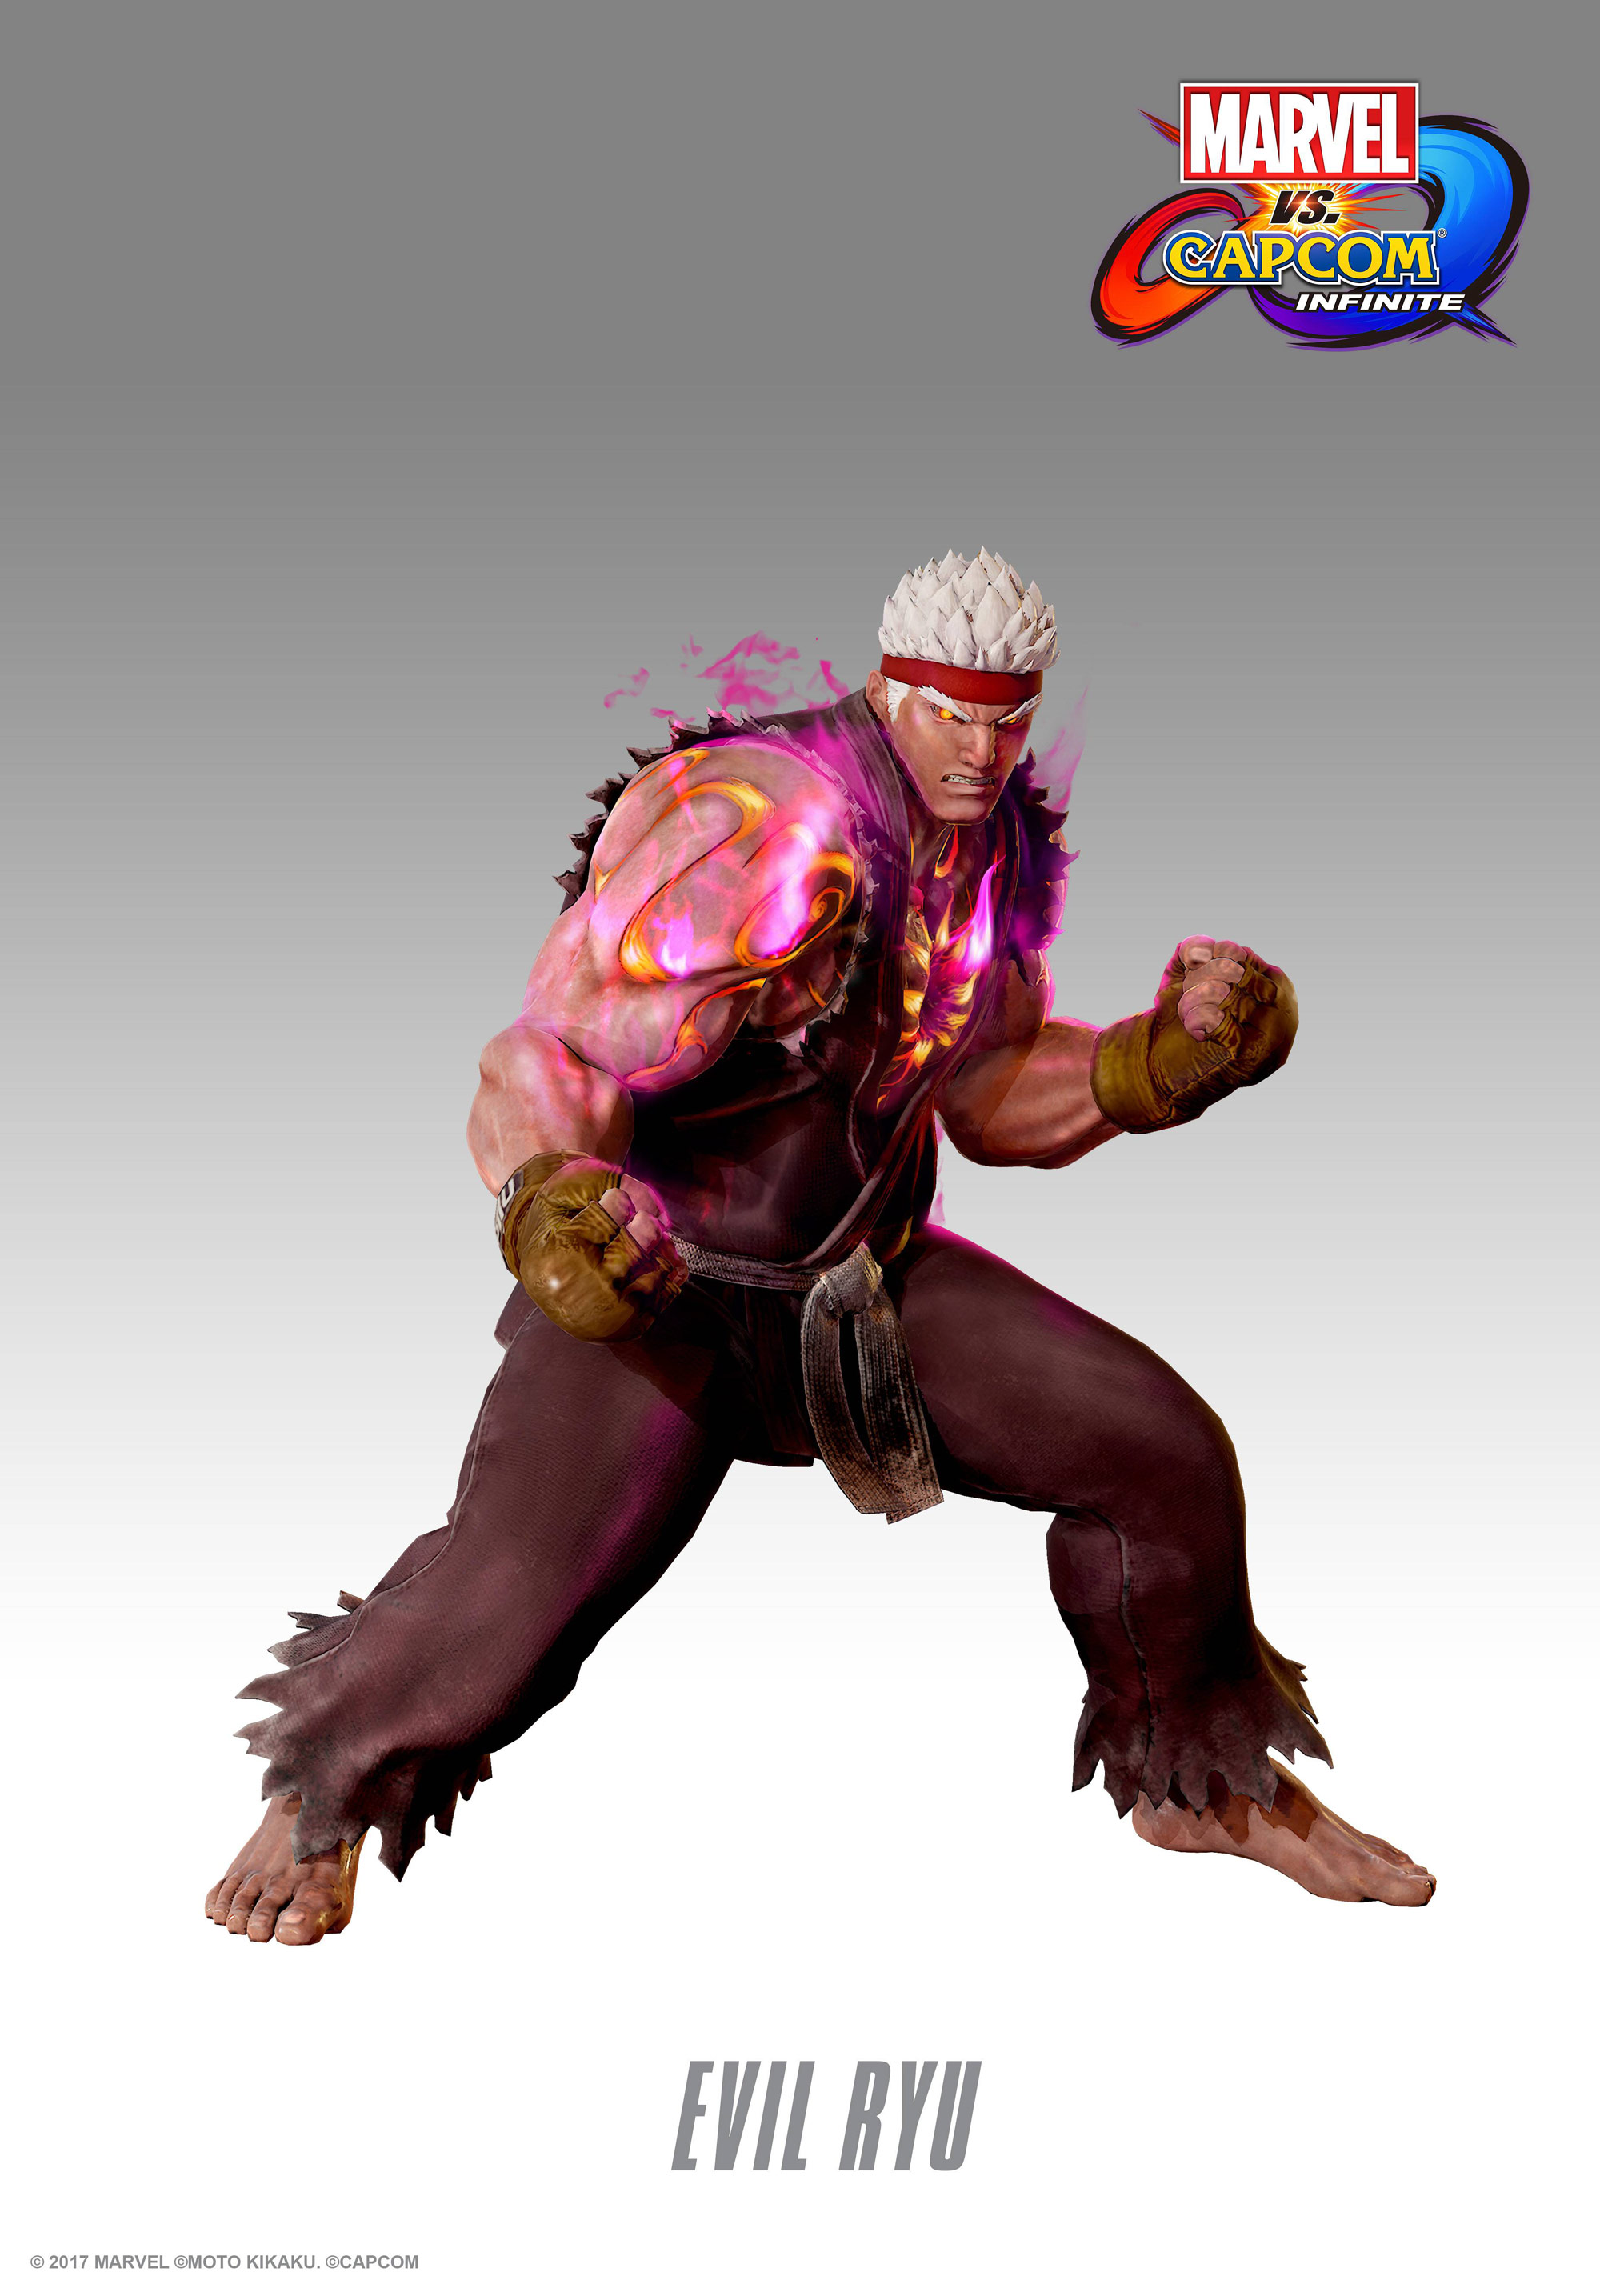 Marvel vs. Capcom: Infinite premium costumes for Mega Man, Ryu, Thor and Hulk 2 out of 4 image gallery